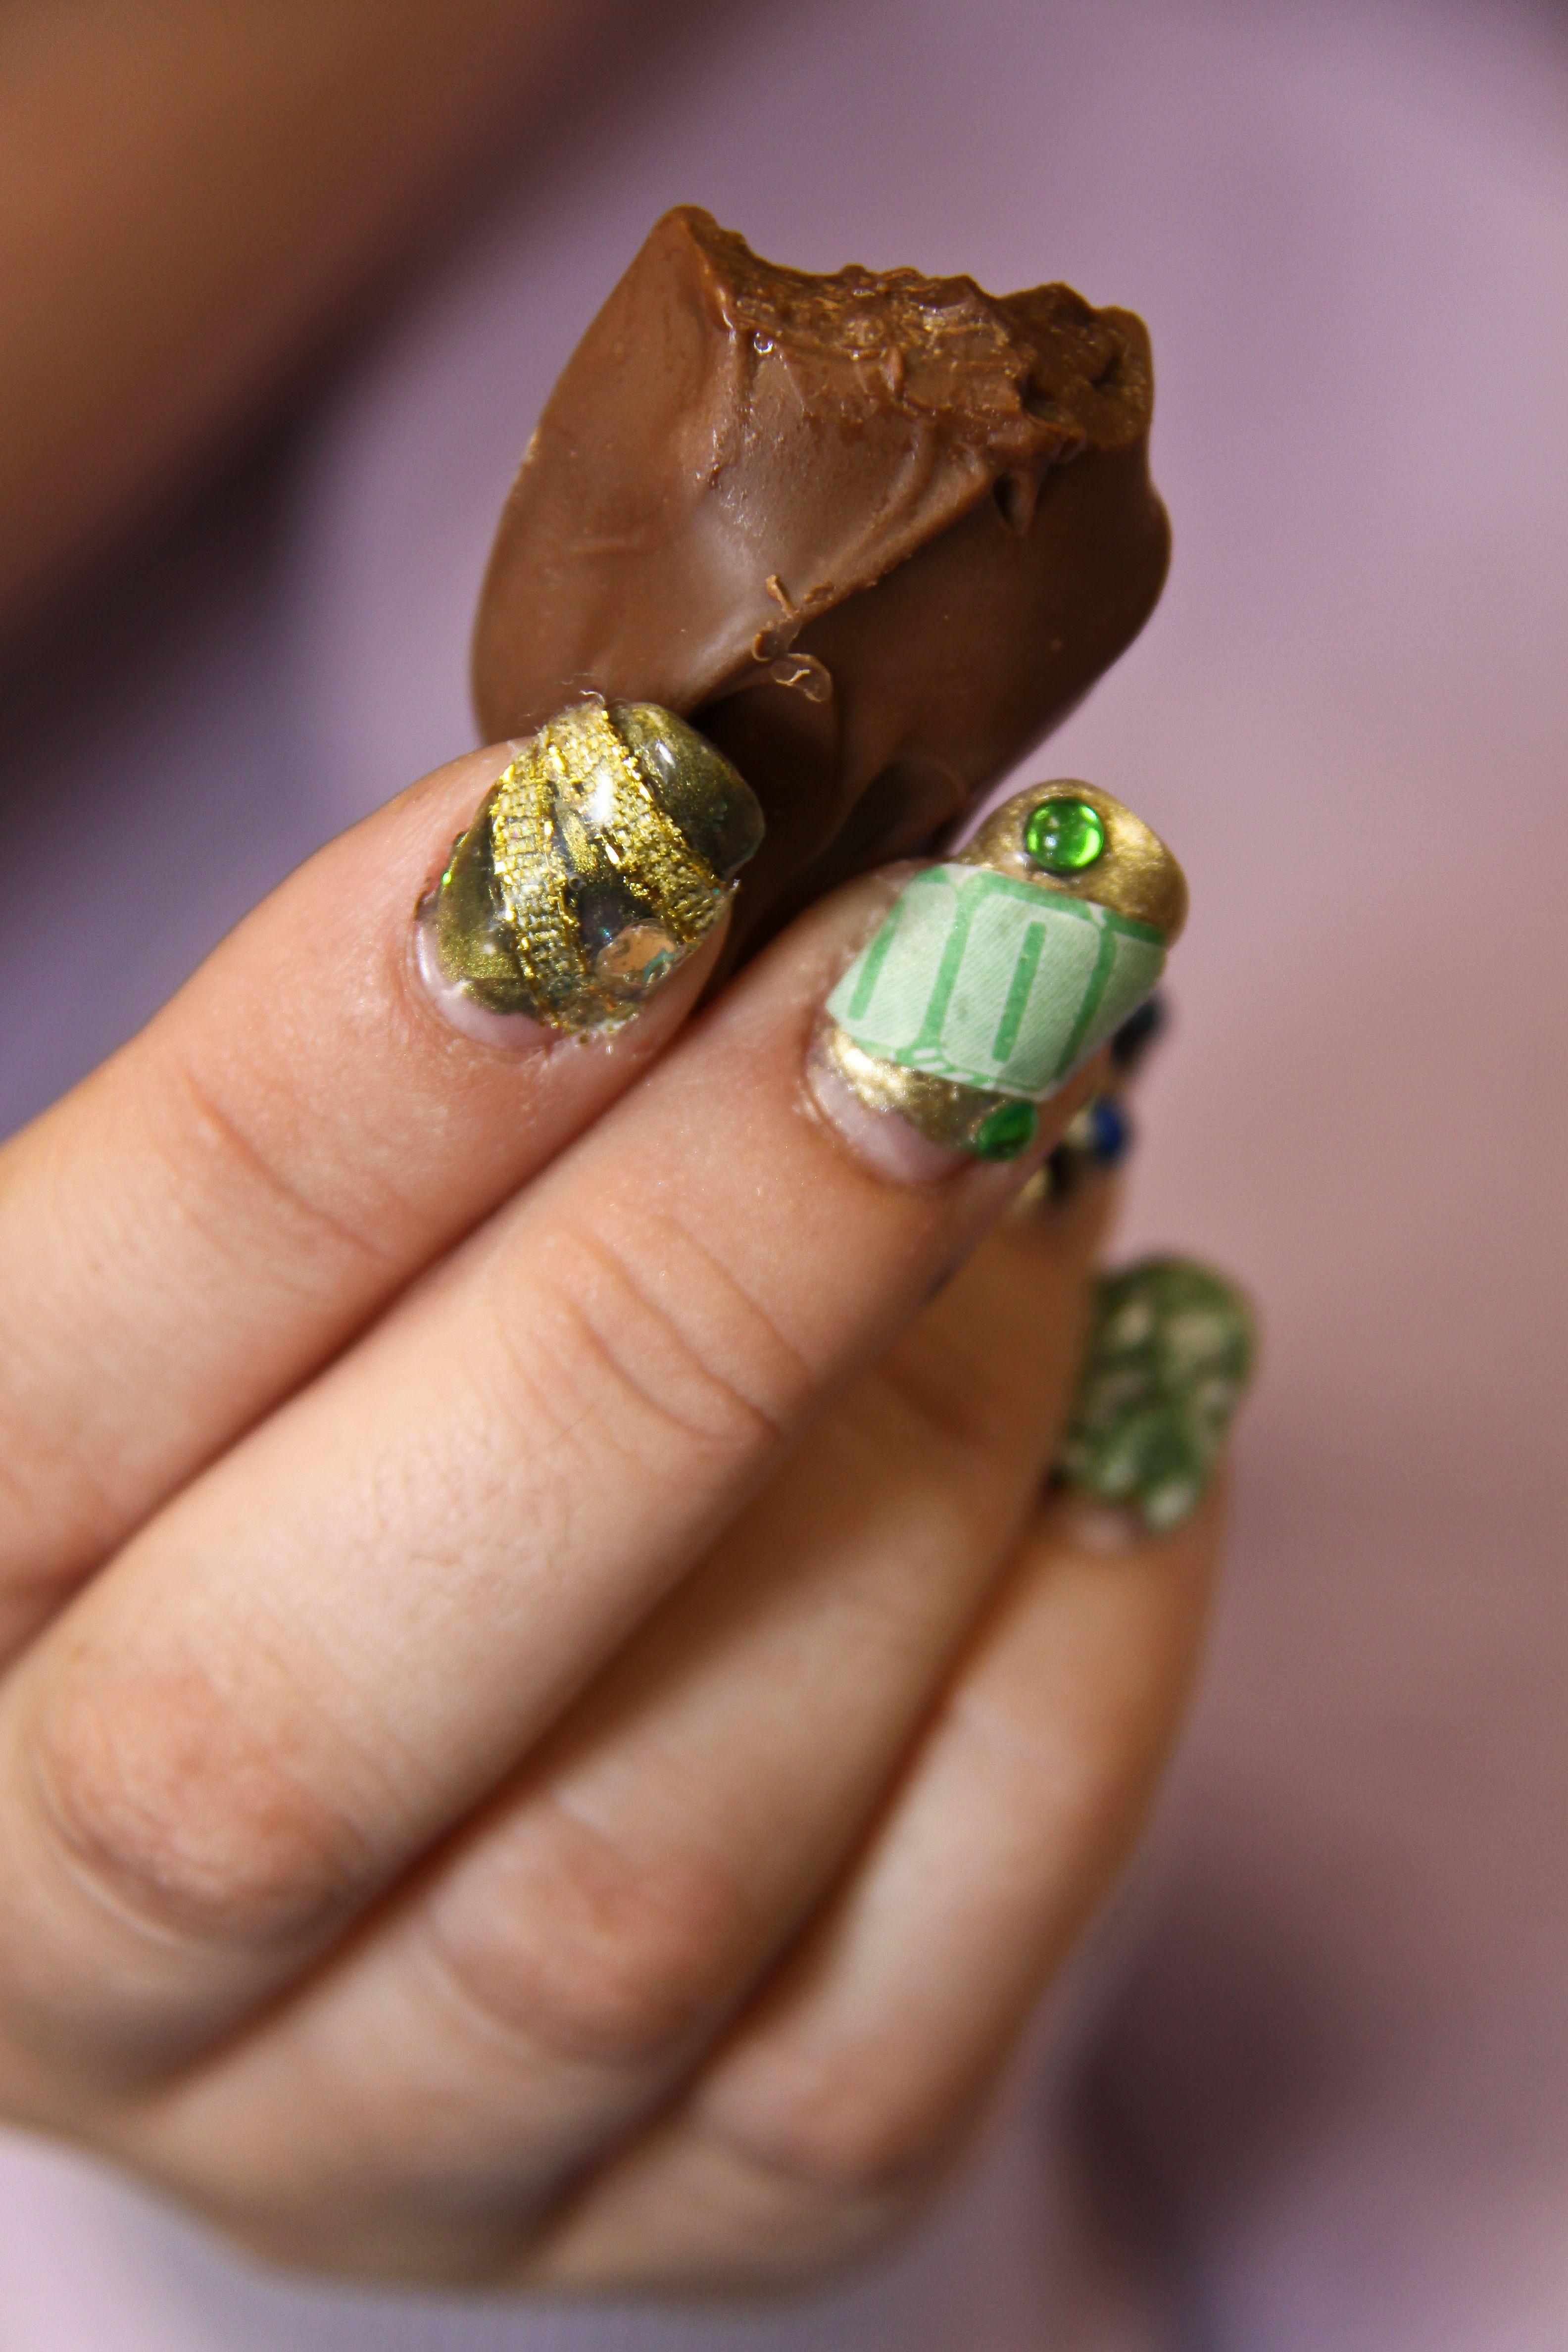 Food-inspired nail art  Seven Deadly Sins Fashion Show  Manhattan, KS